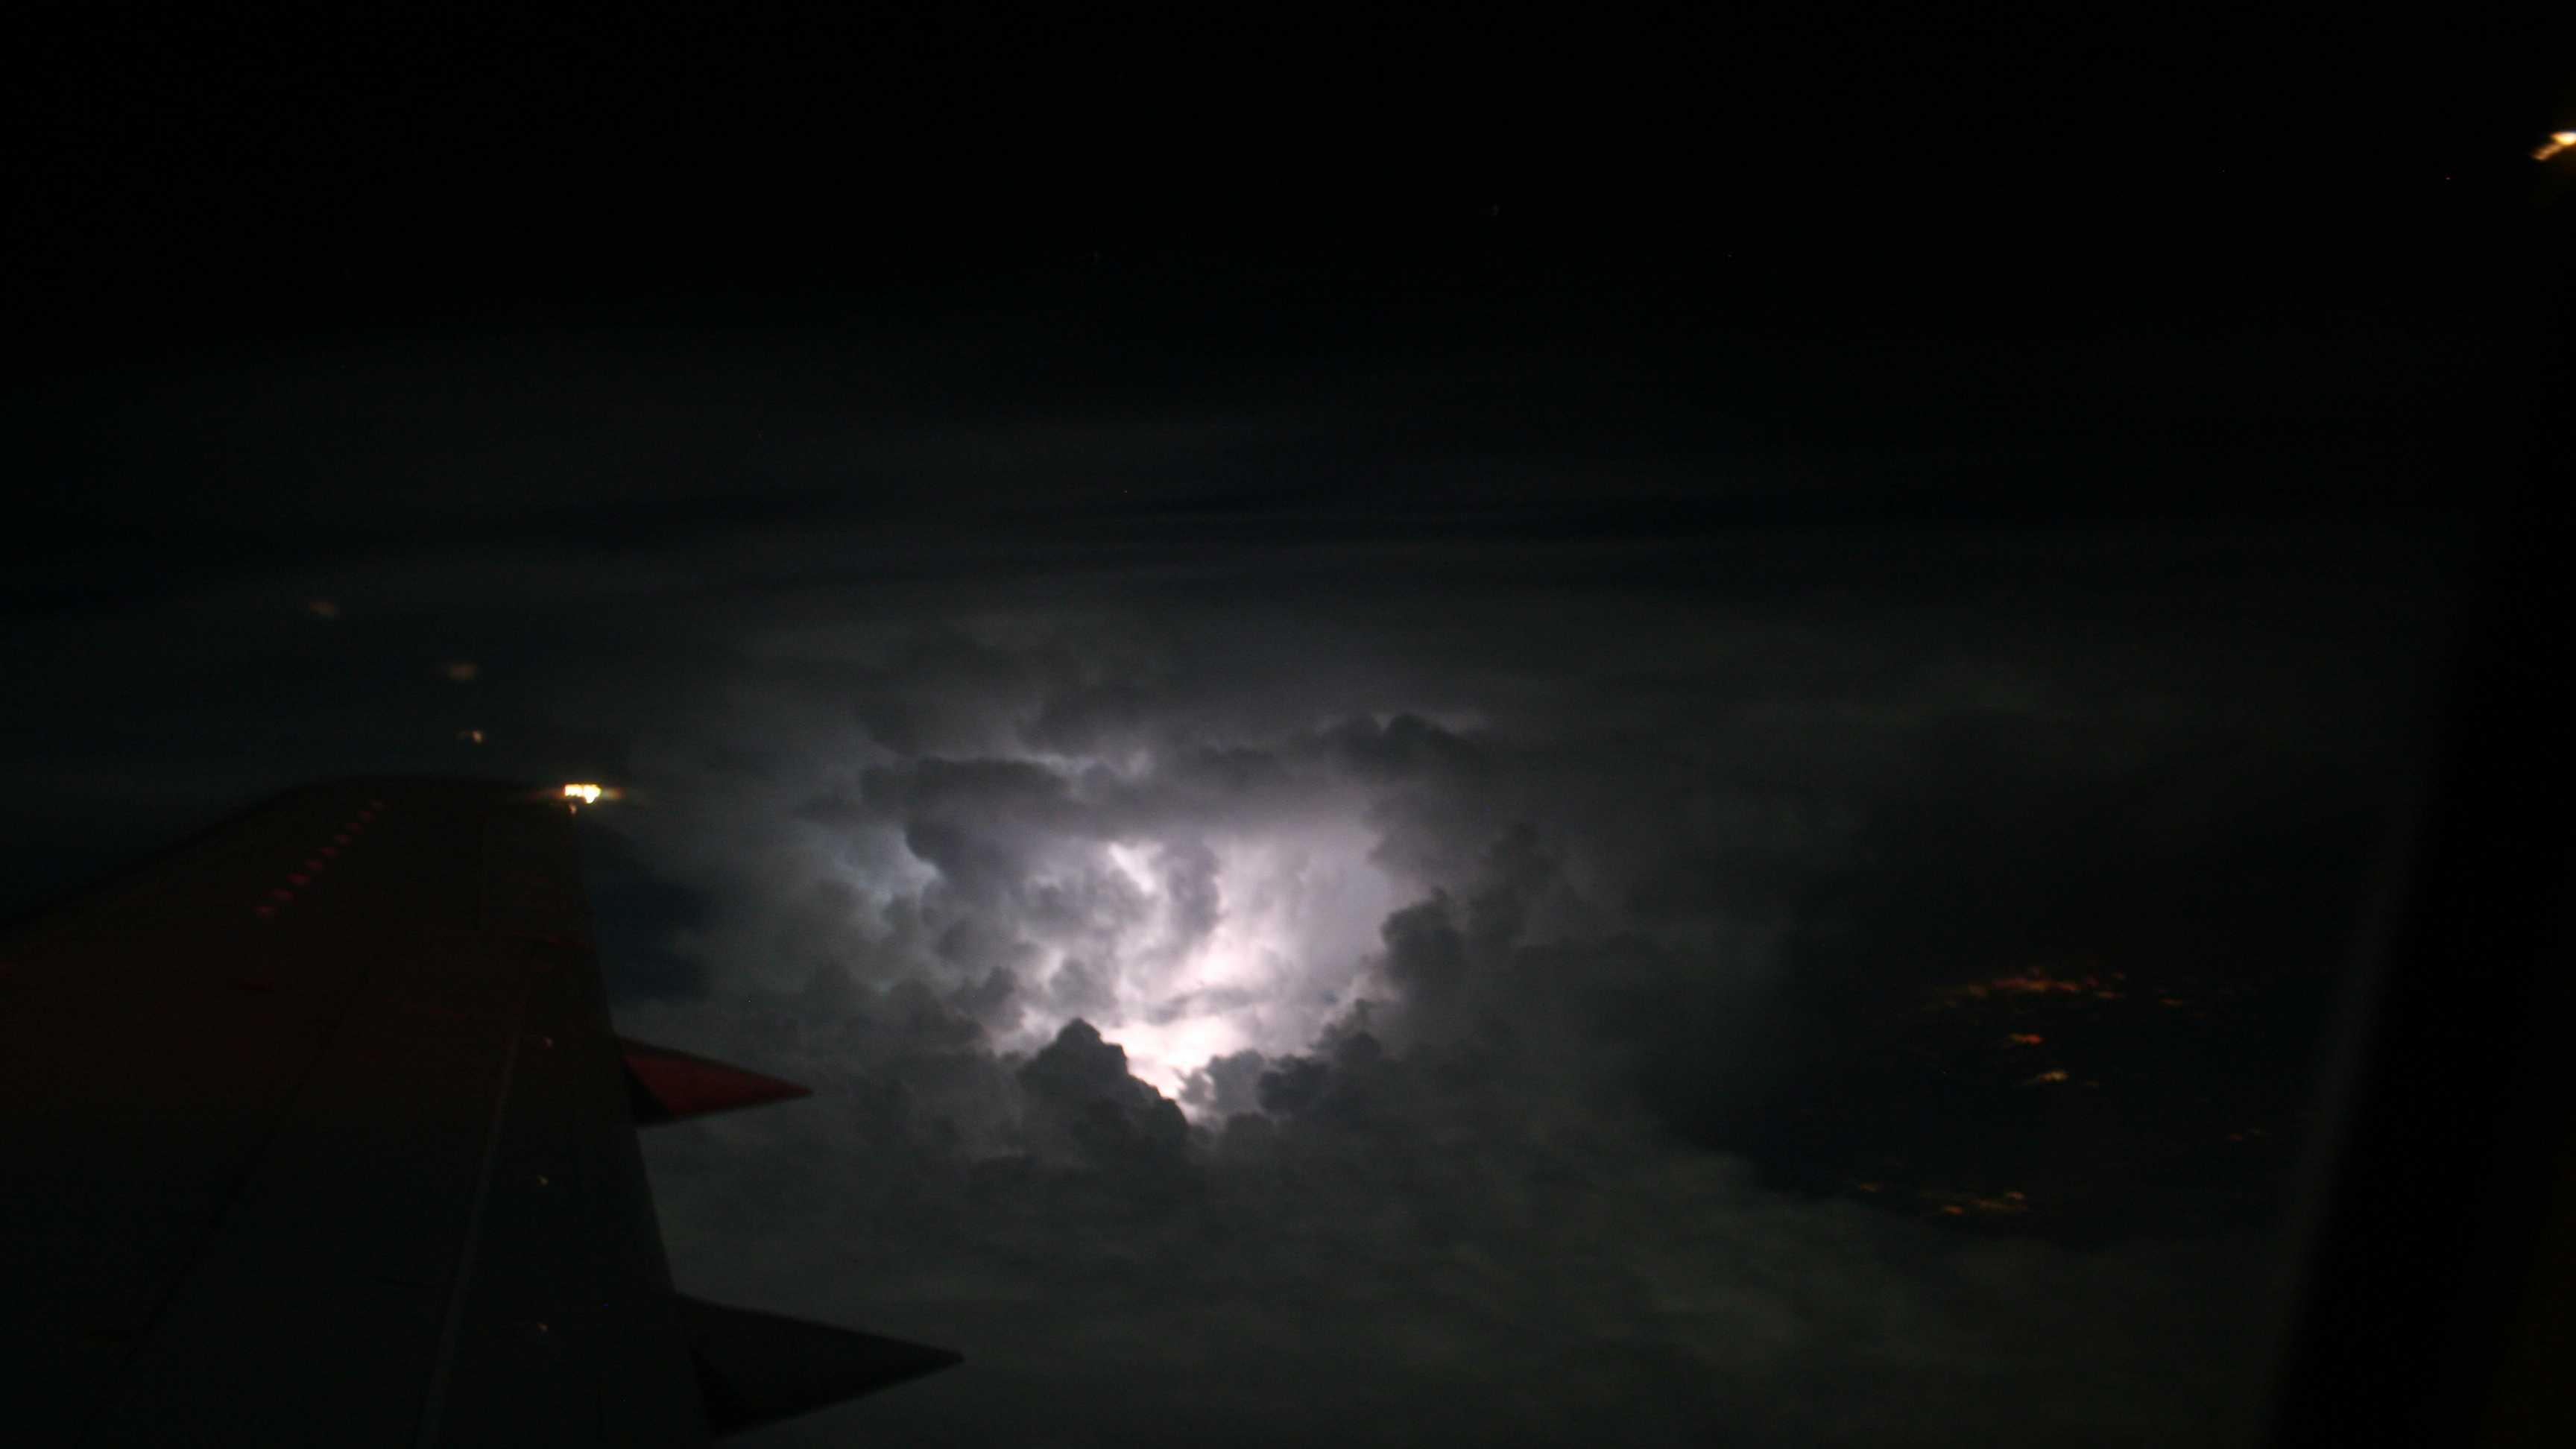 LightningAboveCloudsView.JPG